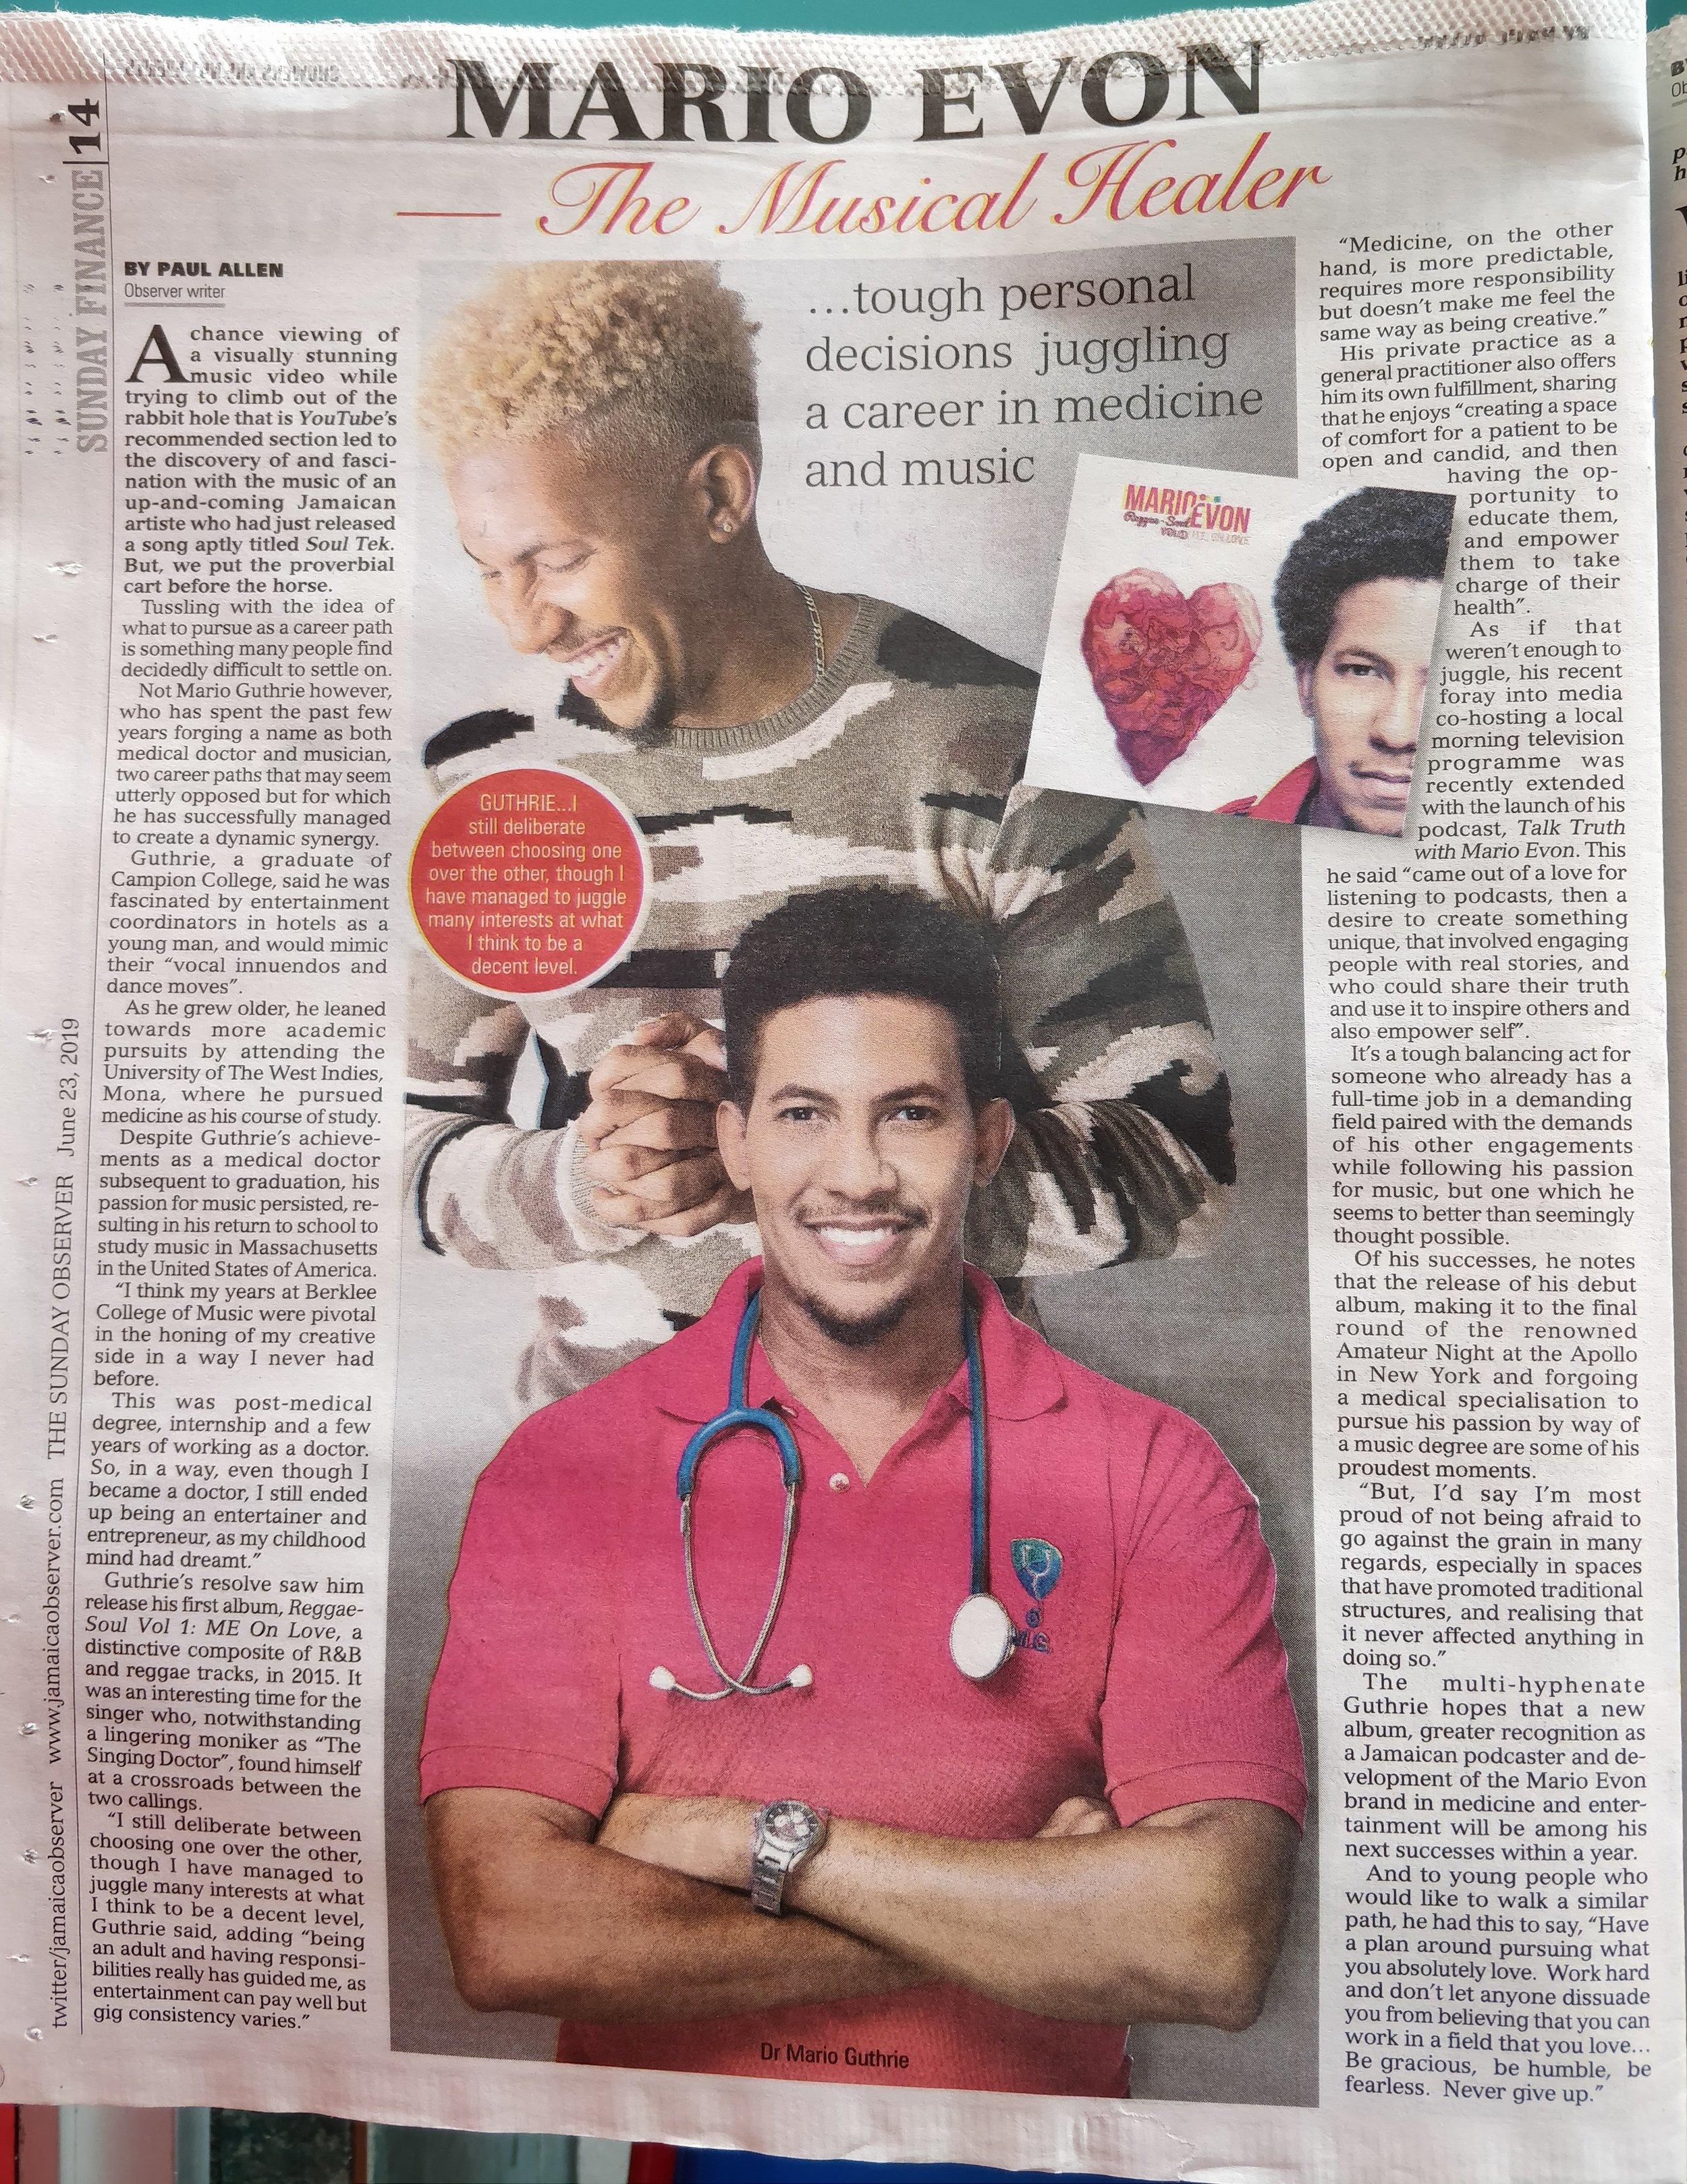 Mario Evon - The Musical Healer (The Jamaica Observer)